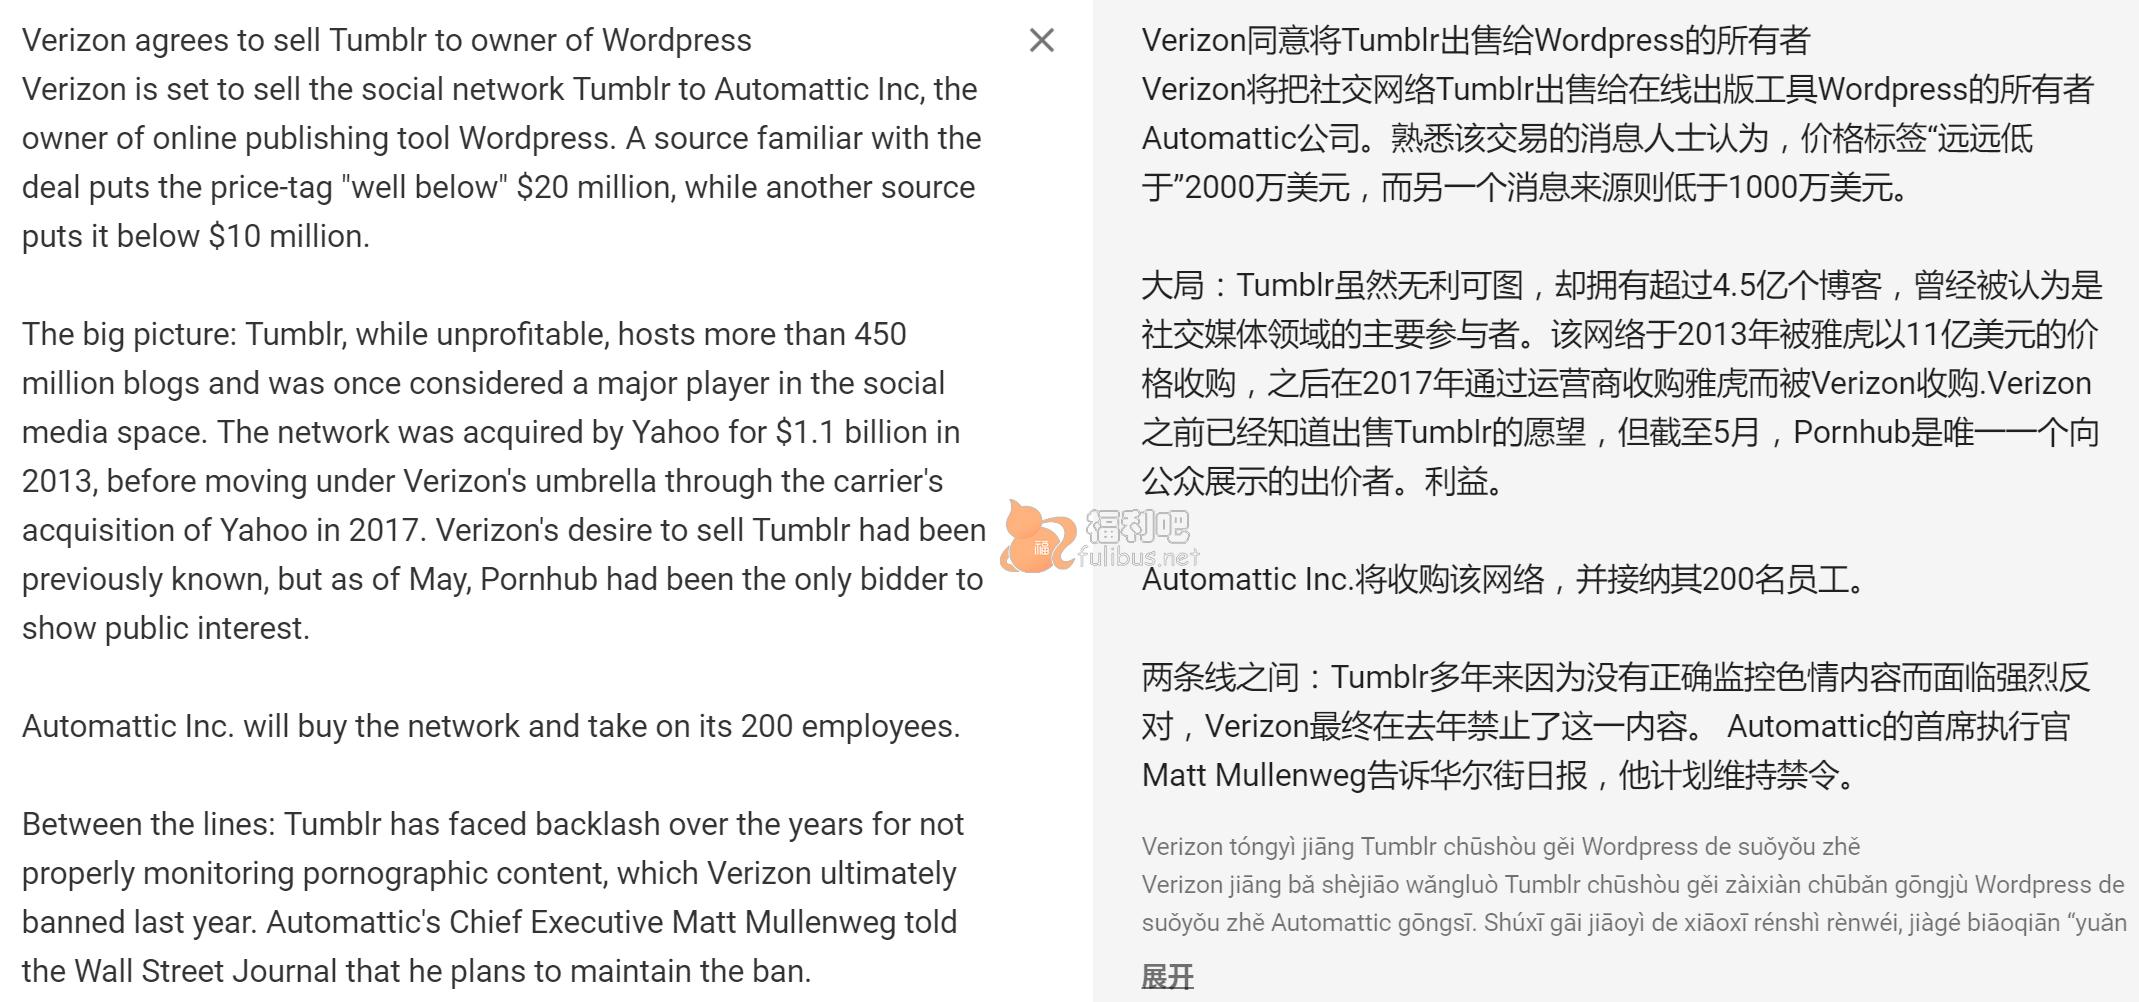 Tumblr已转让,买家为Automattic Inc,将继续维持禁令  文章推荐  图1